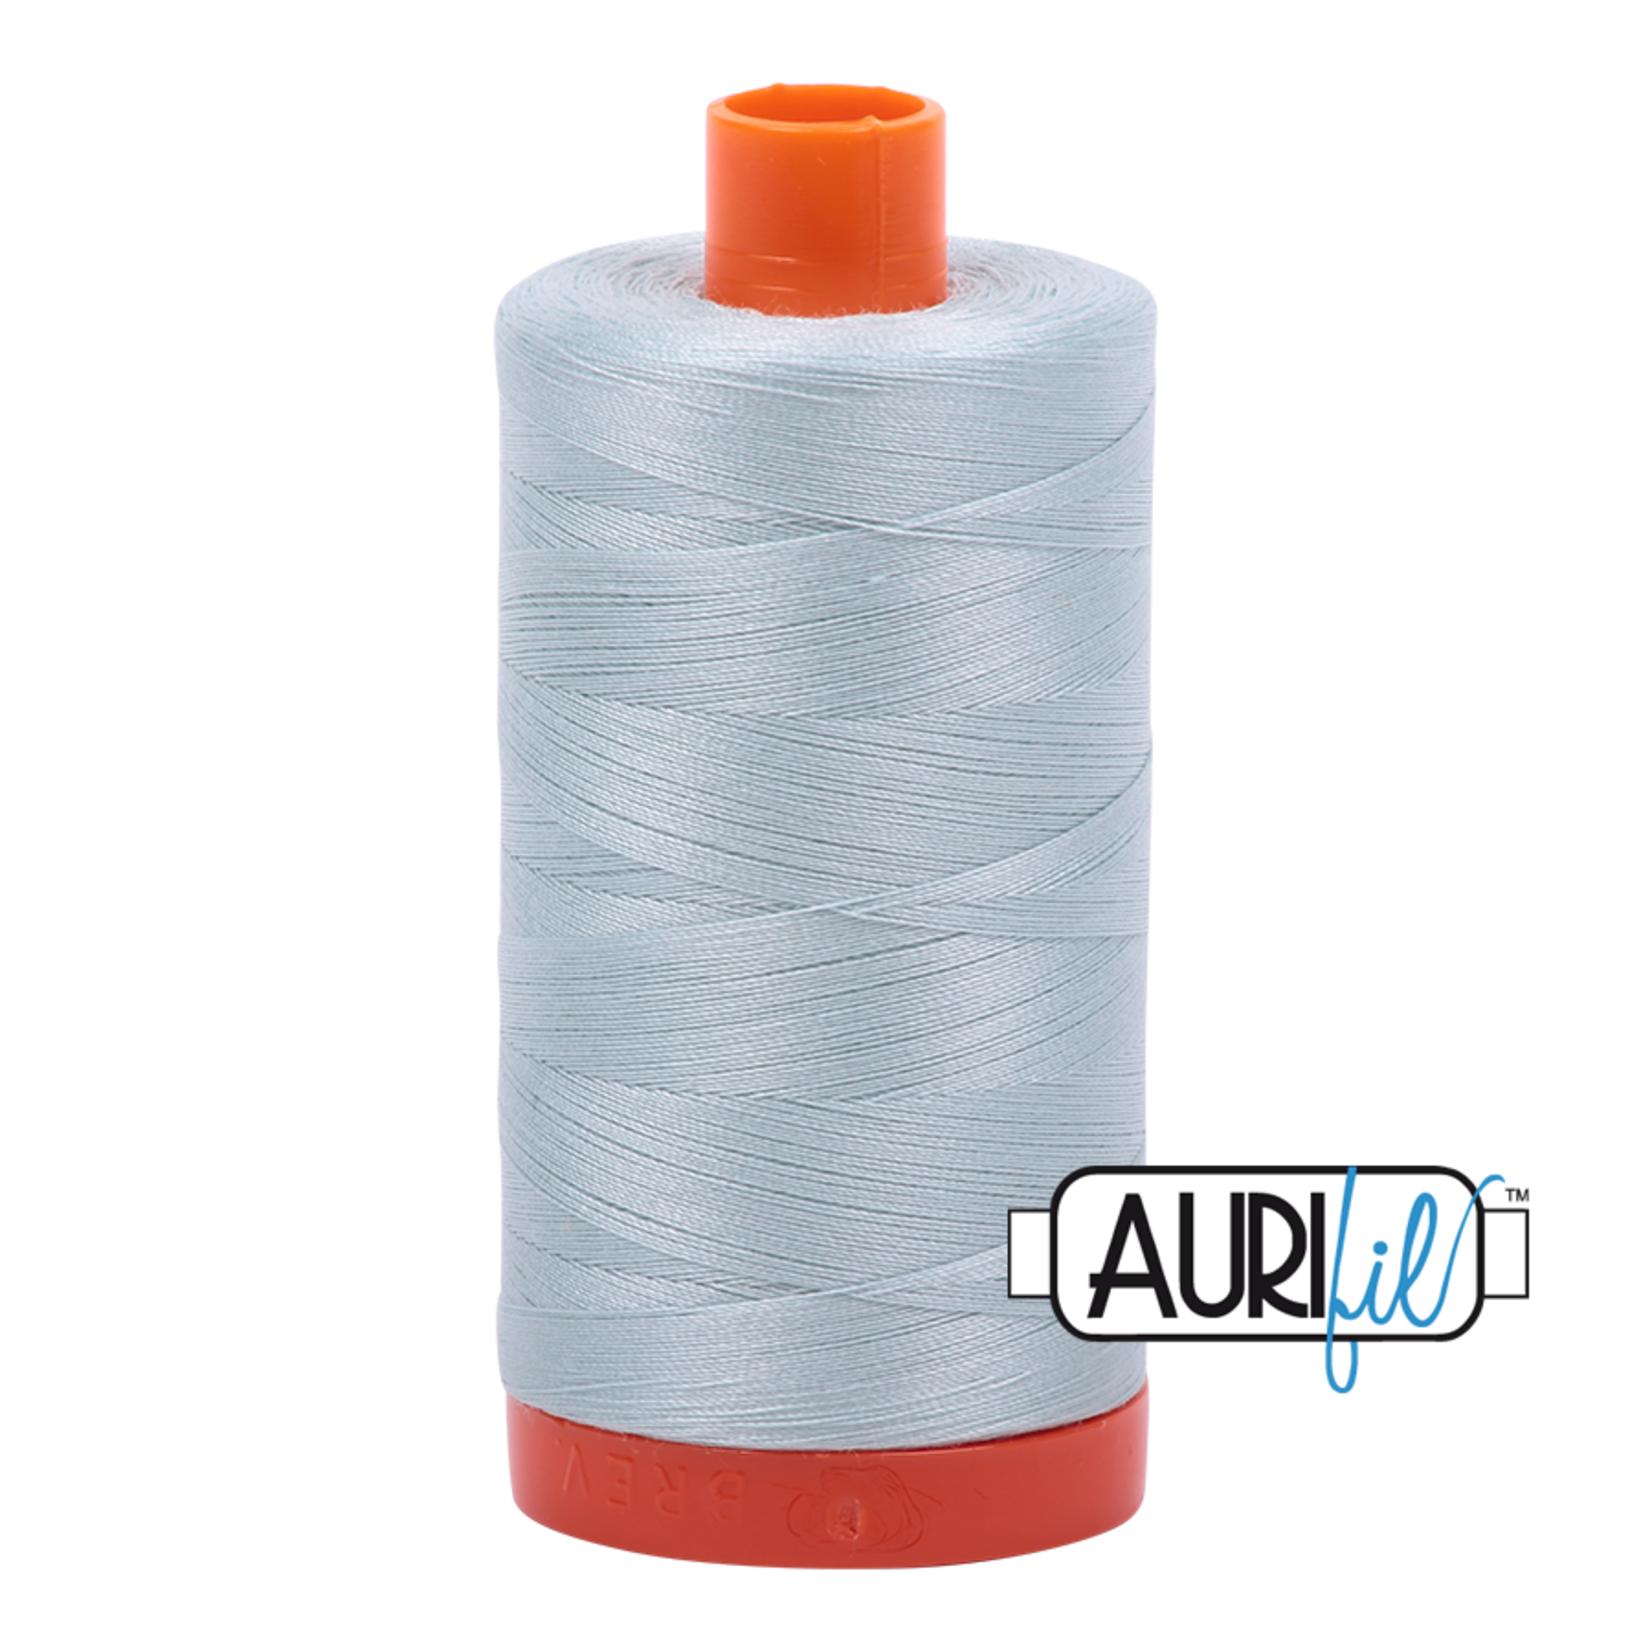 AURIFIL AURIFIL 50 WT Light Grey Blue 5007